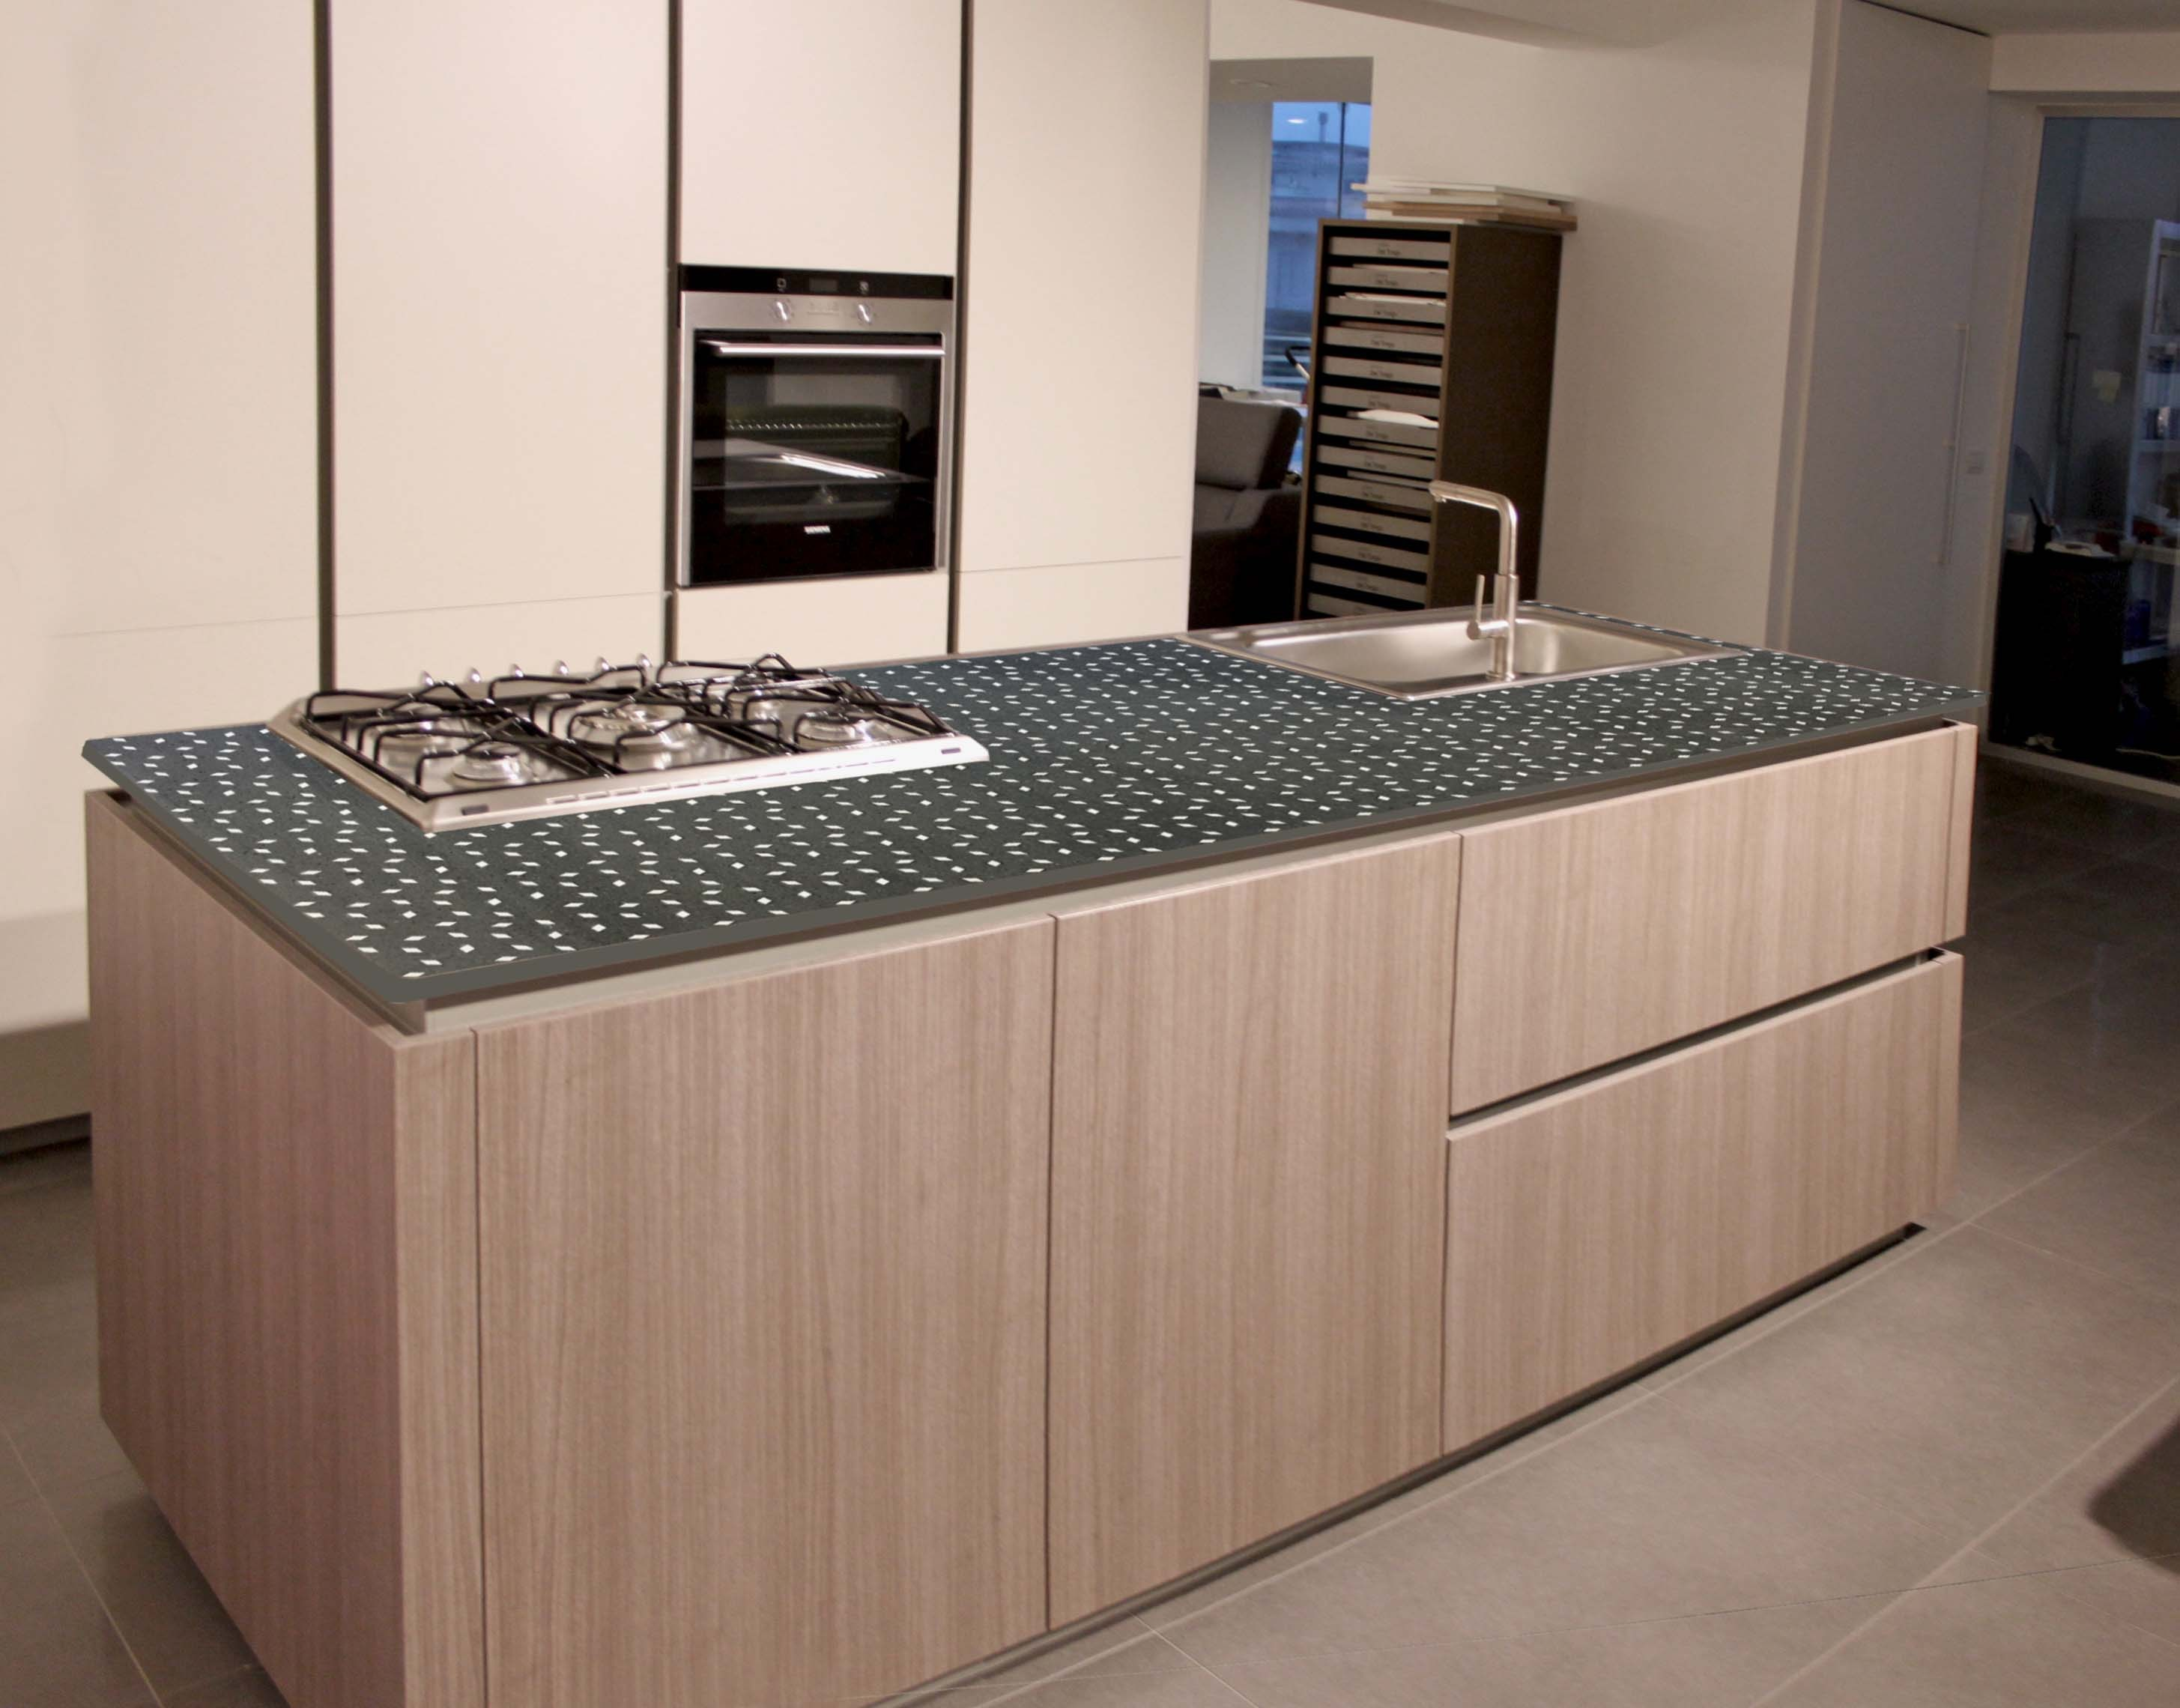 Top cucina in pietra lavica By Sgarlata